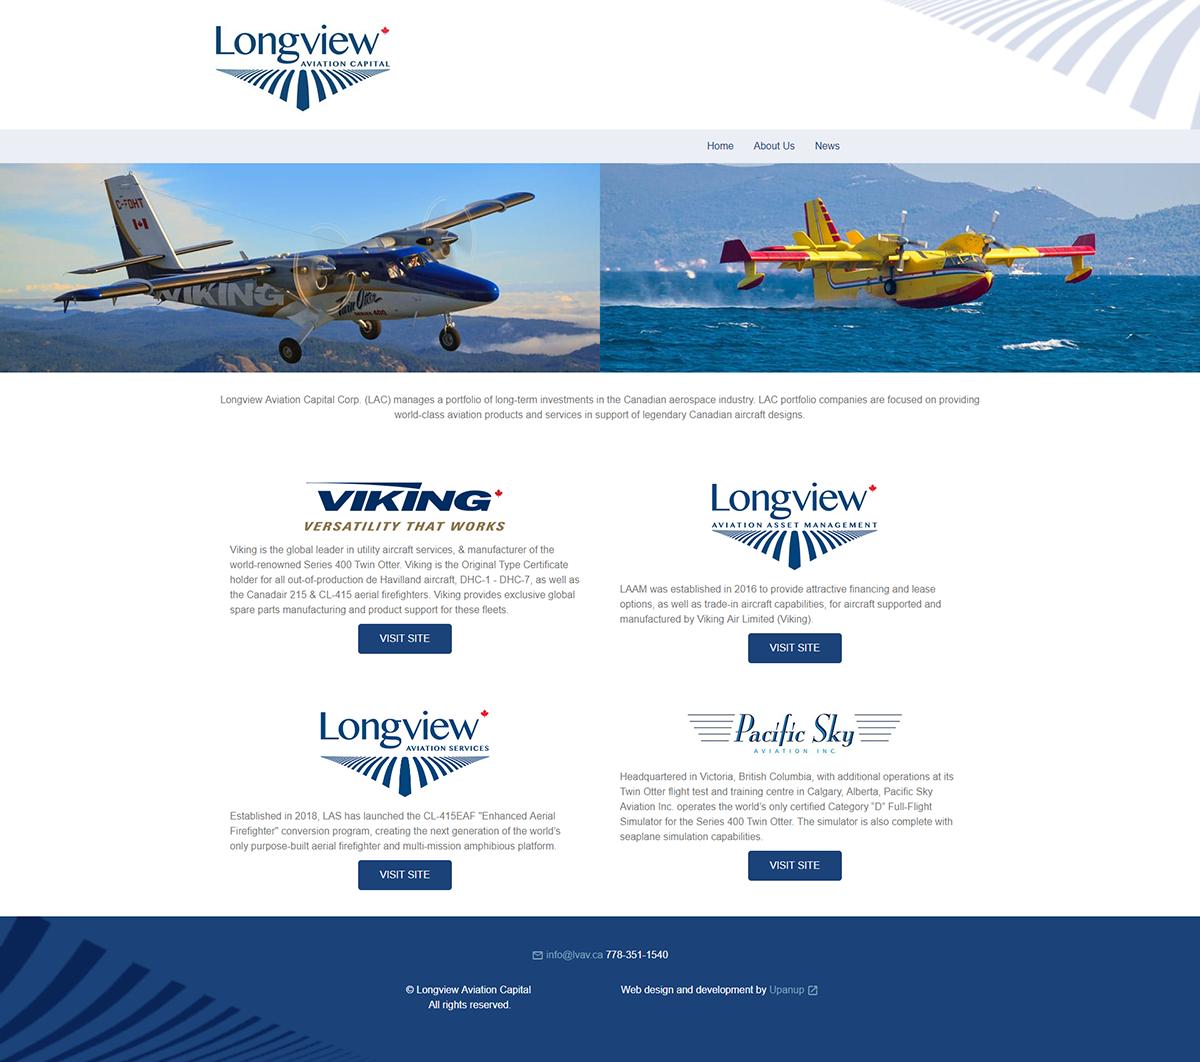 LONGVIEW_DIRECTORY_SCREENSHOT.png